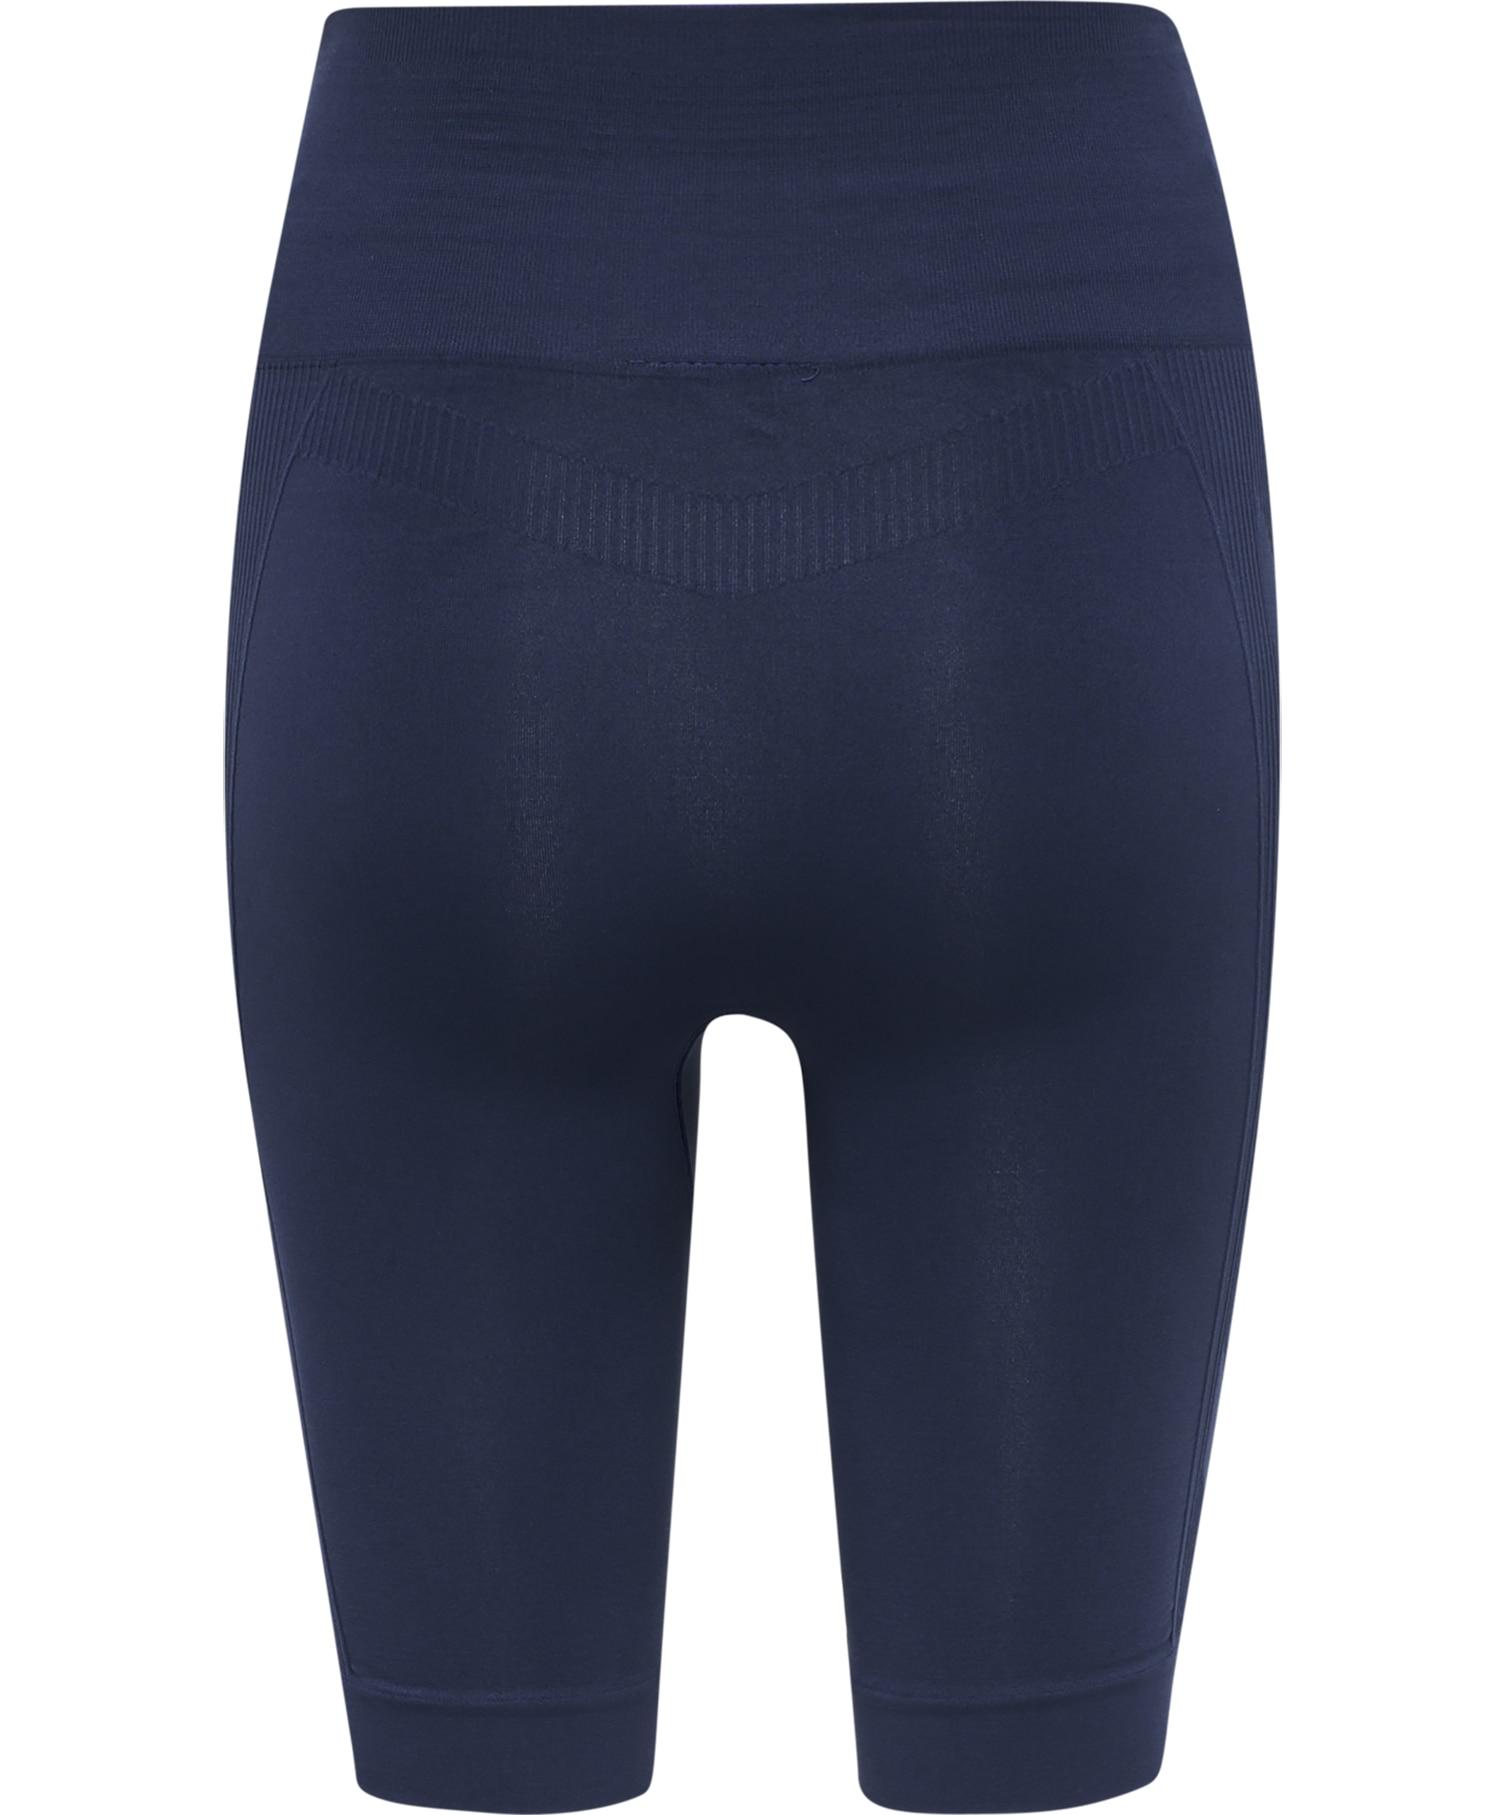 Hummel Seamless cyling shorts